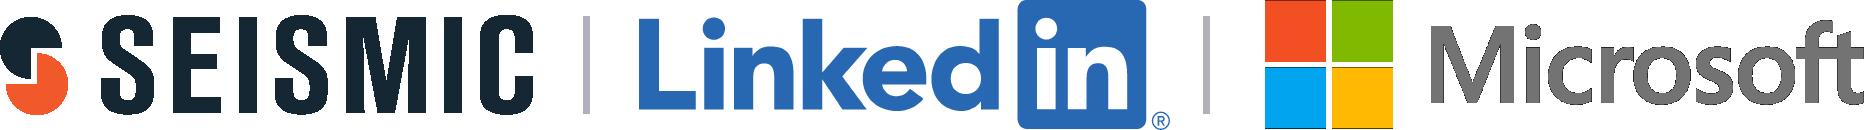 seismic-linkedin-microsoft_logo